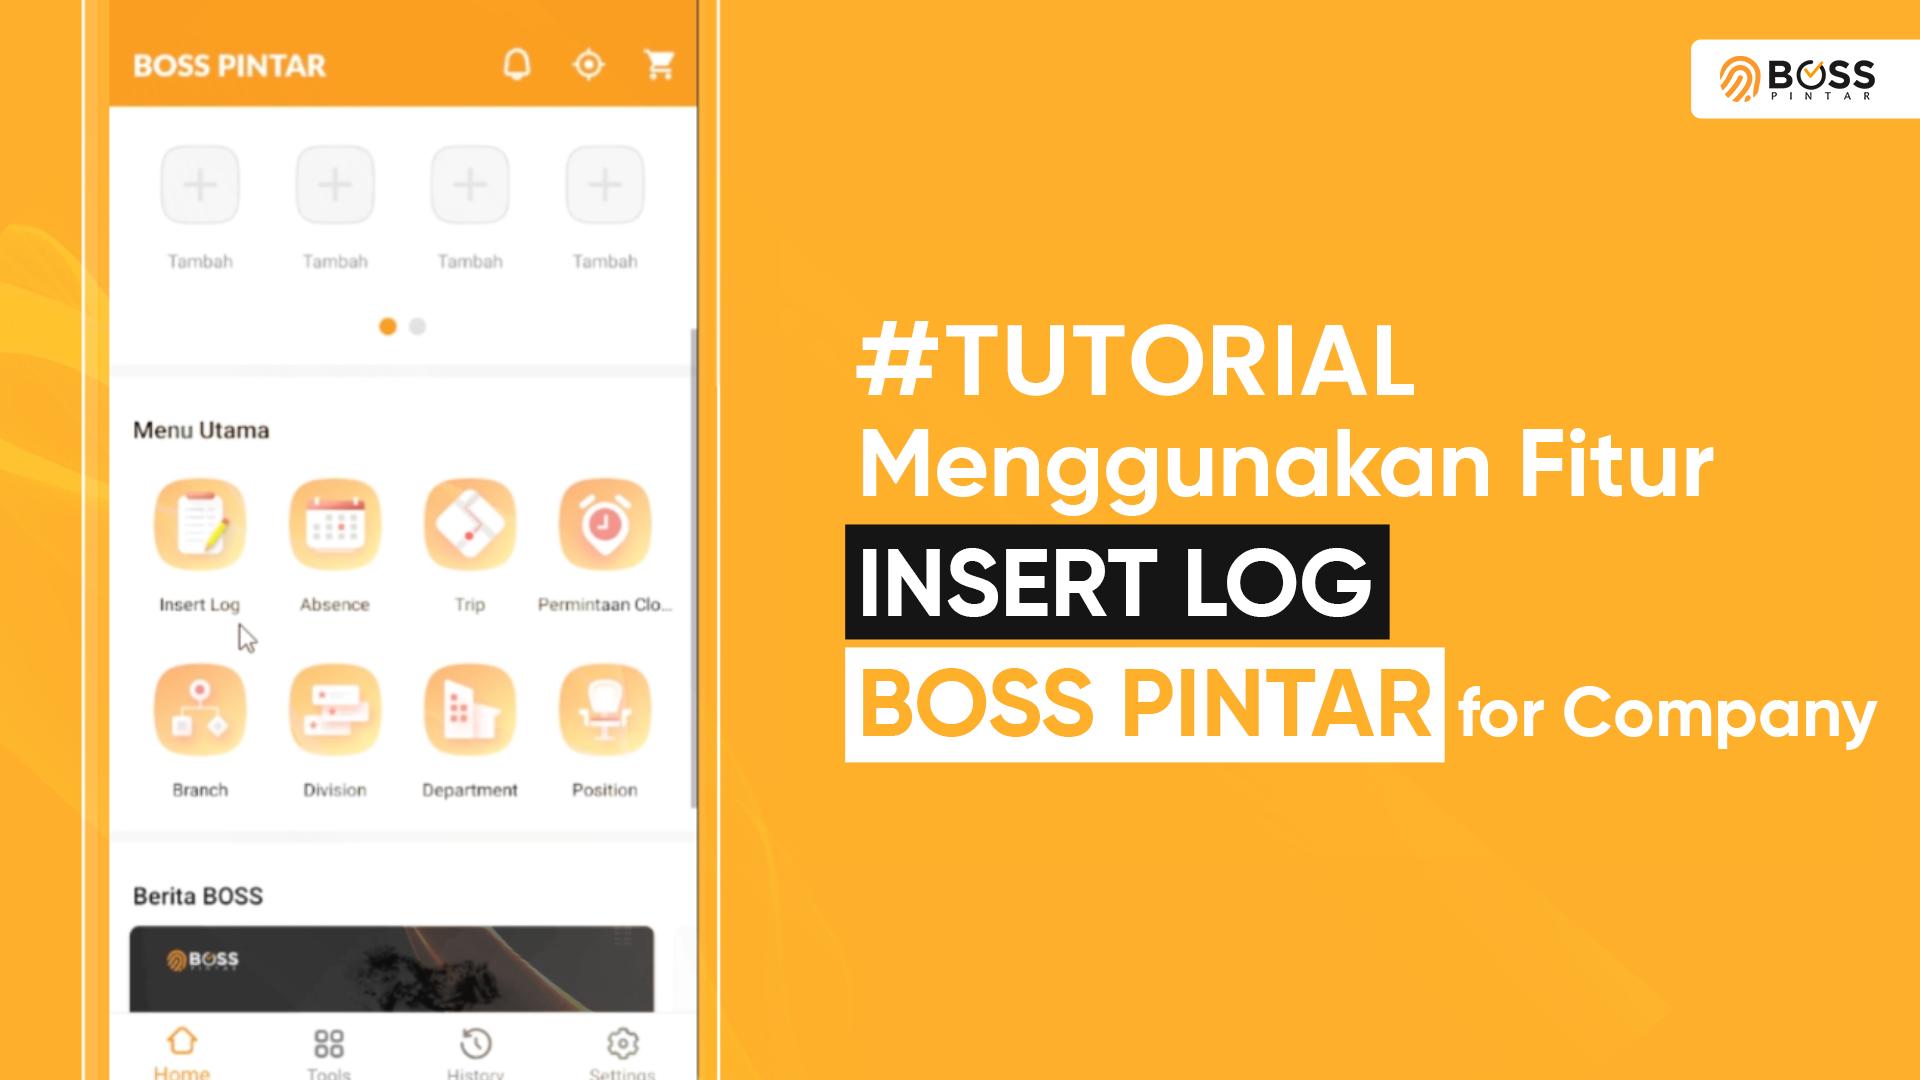 BOSS Pintar Company | Cara Menggunakan Fitur Insert Log